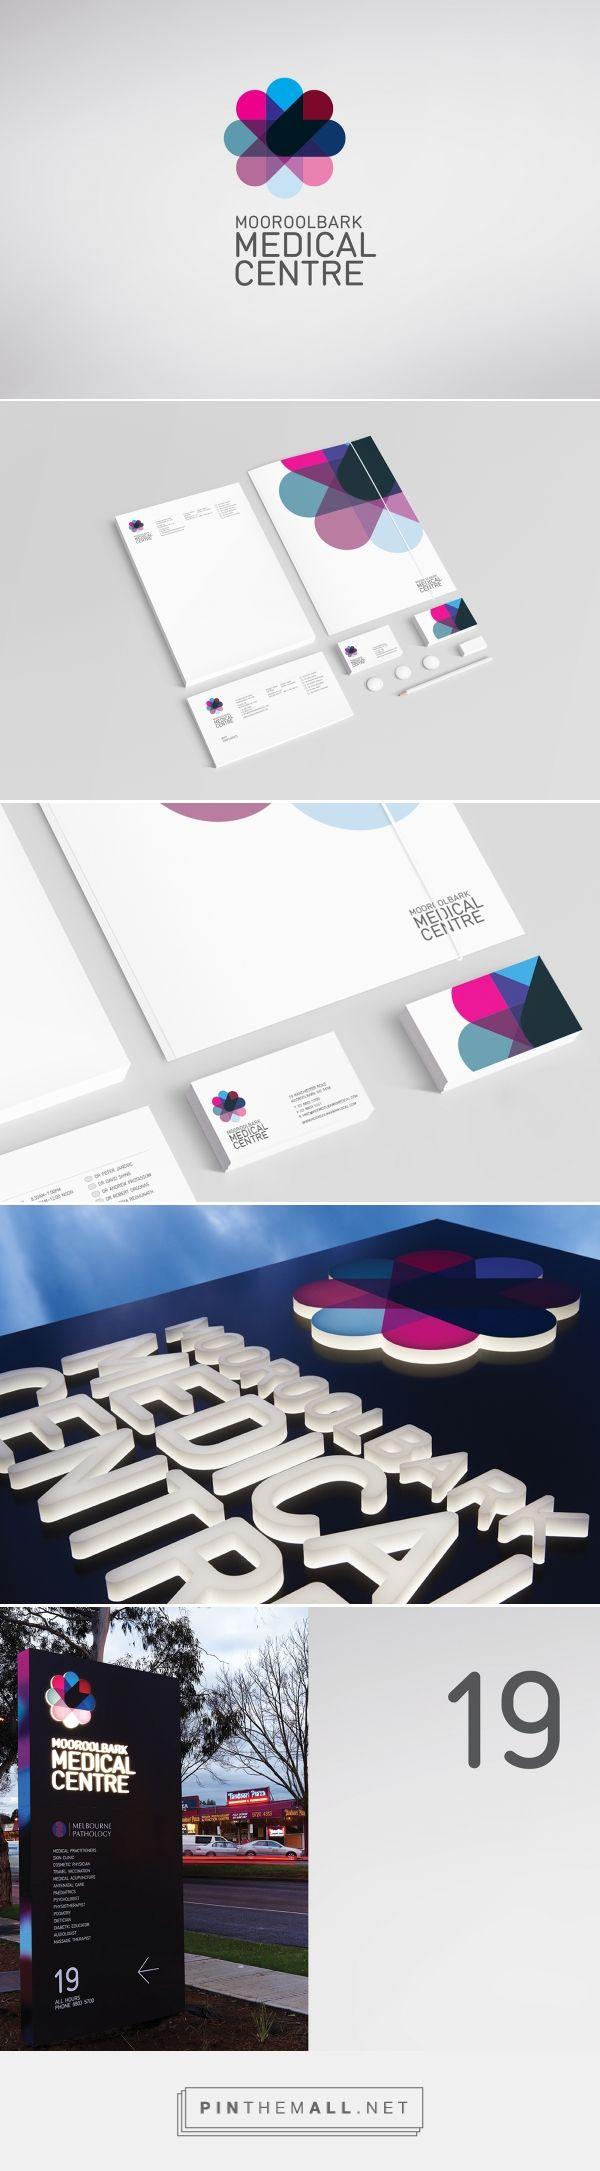 Mooroolbark Medical Center Branding on Behance   Fivestar Branding – Design and Branding Agency & Inspiration Gallery   Professional Logo and Website Design